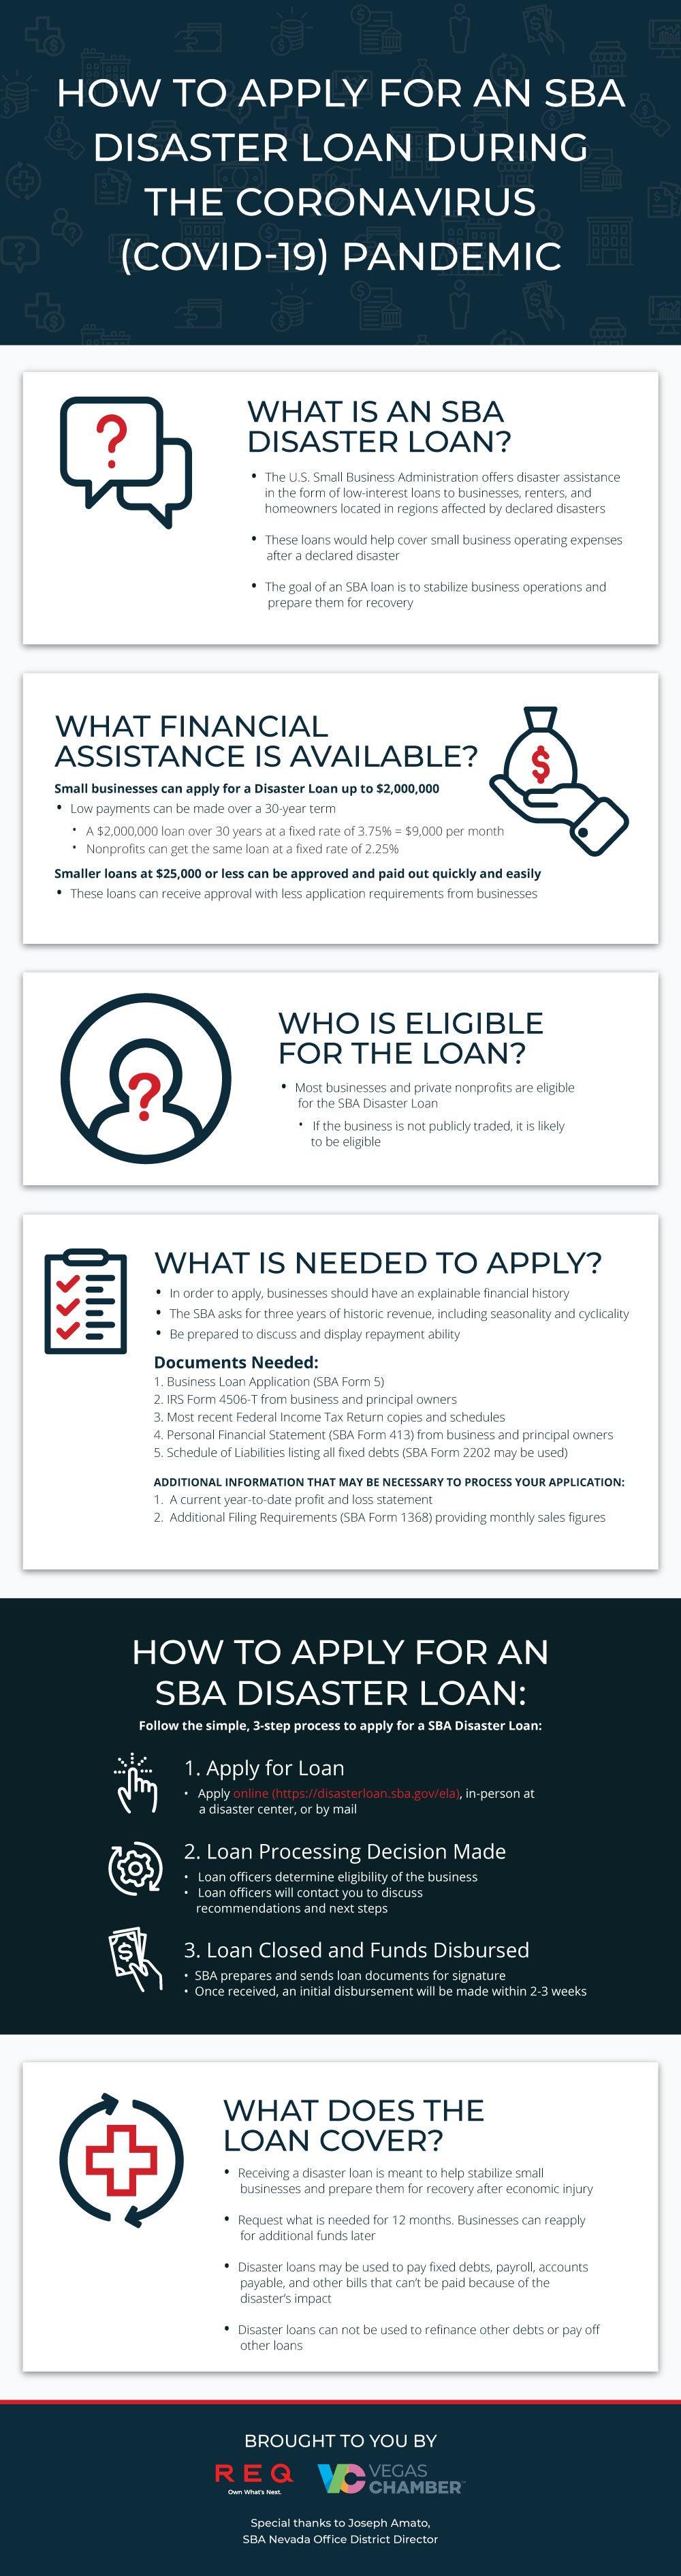 COVID-19 Coronavirus SBA Disaster Loan Assistance [Infographic]